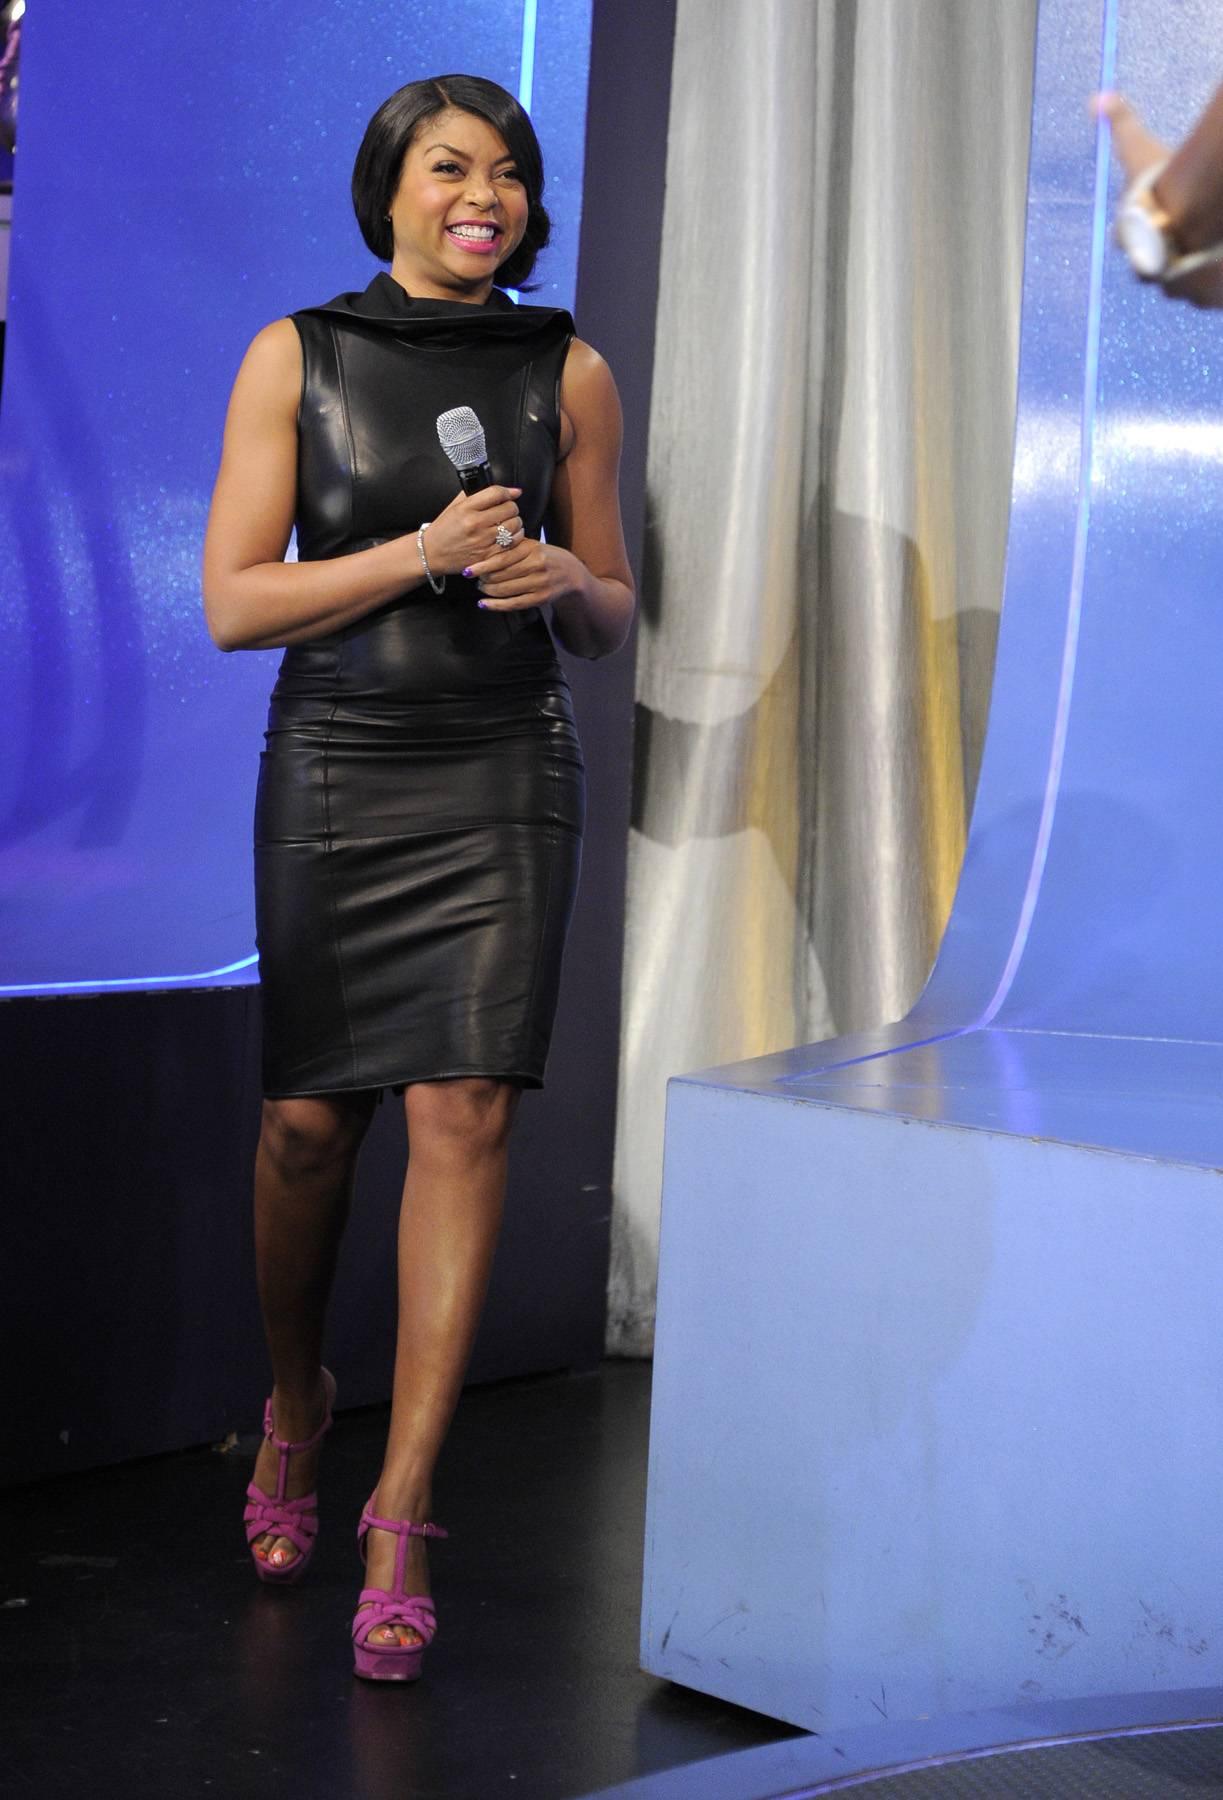 Walk Right Up - Taraji P. Henson takes the stage at 106 & Park, April 17, 2012. (Photo: John Ricard/BET)